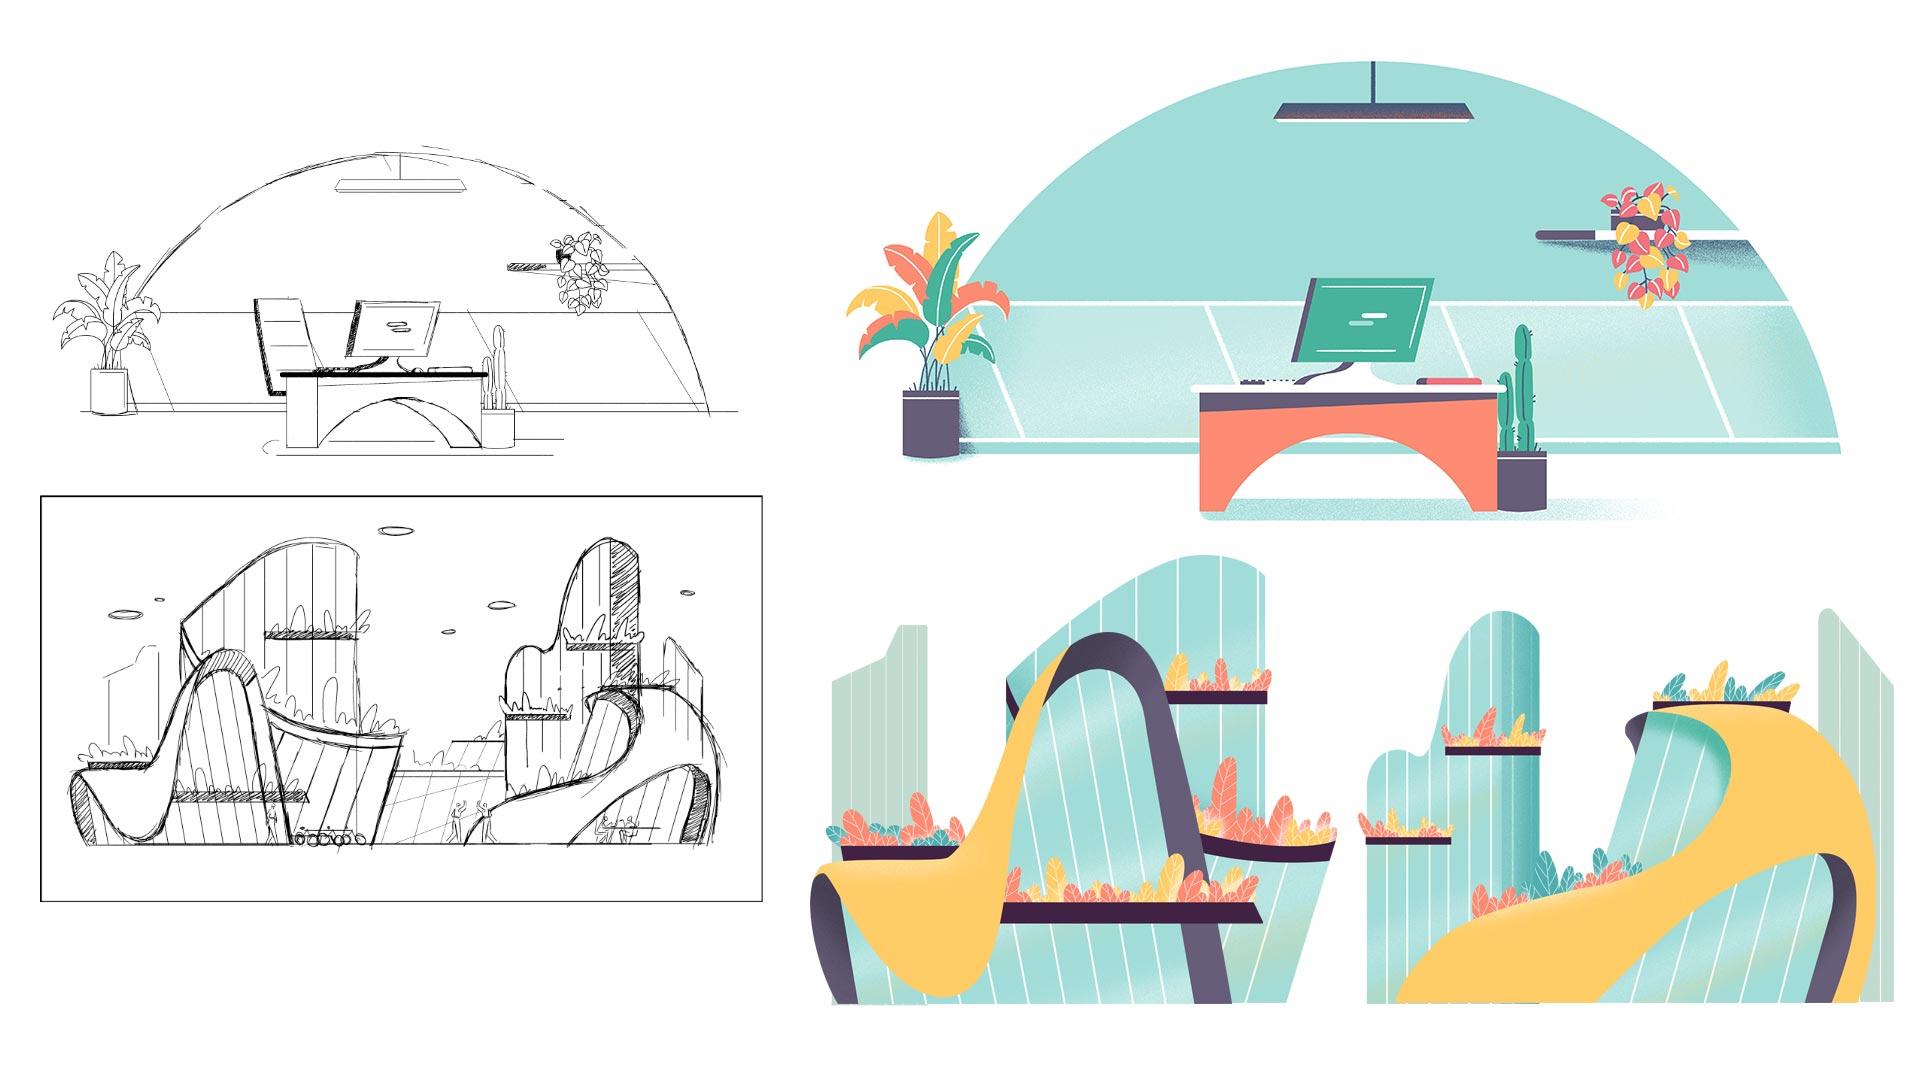 job_stations_animation_character_racoonstudio_motion_design_11